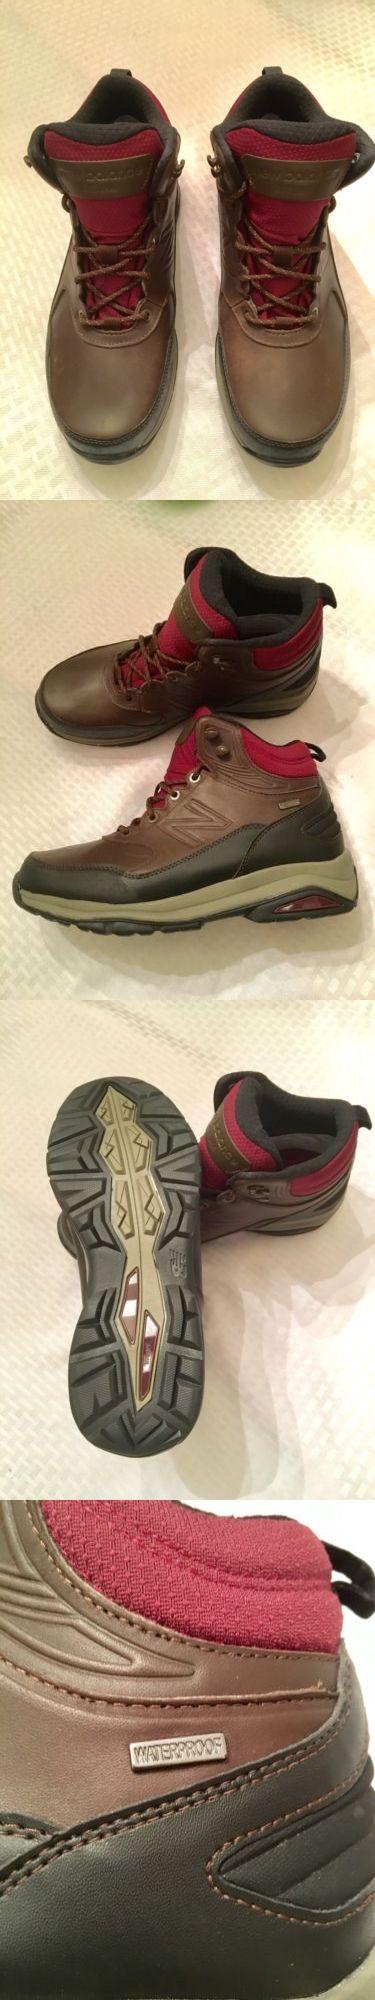 Womens 181393: New Balance Women S Trail Walking Boot, Size 10 D -> BUY IT NOW ONLY: $44.99 on eBay!